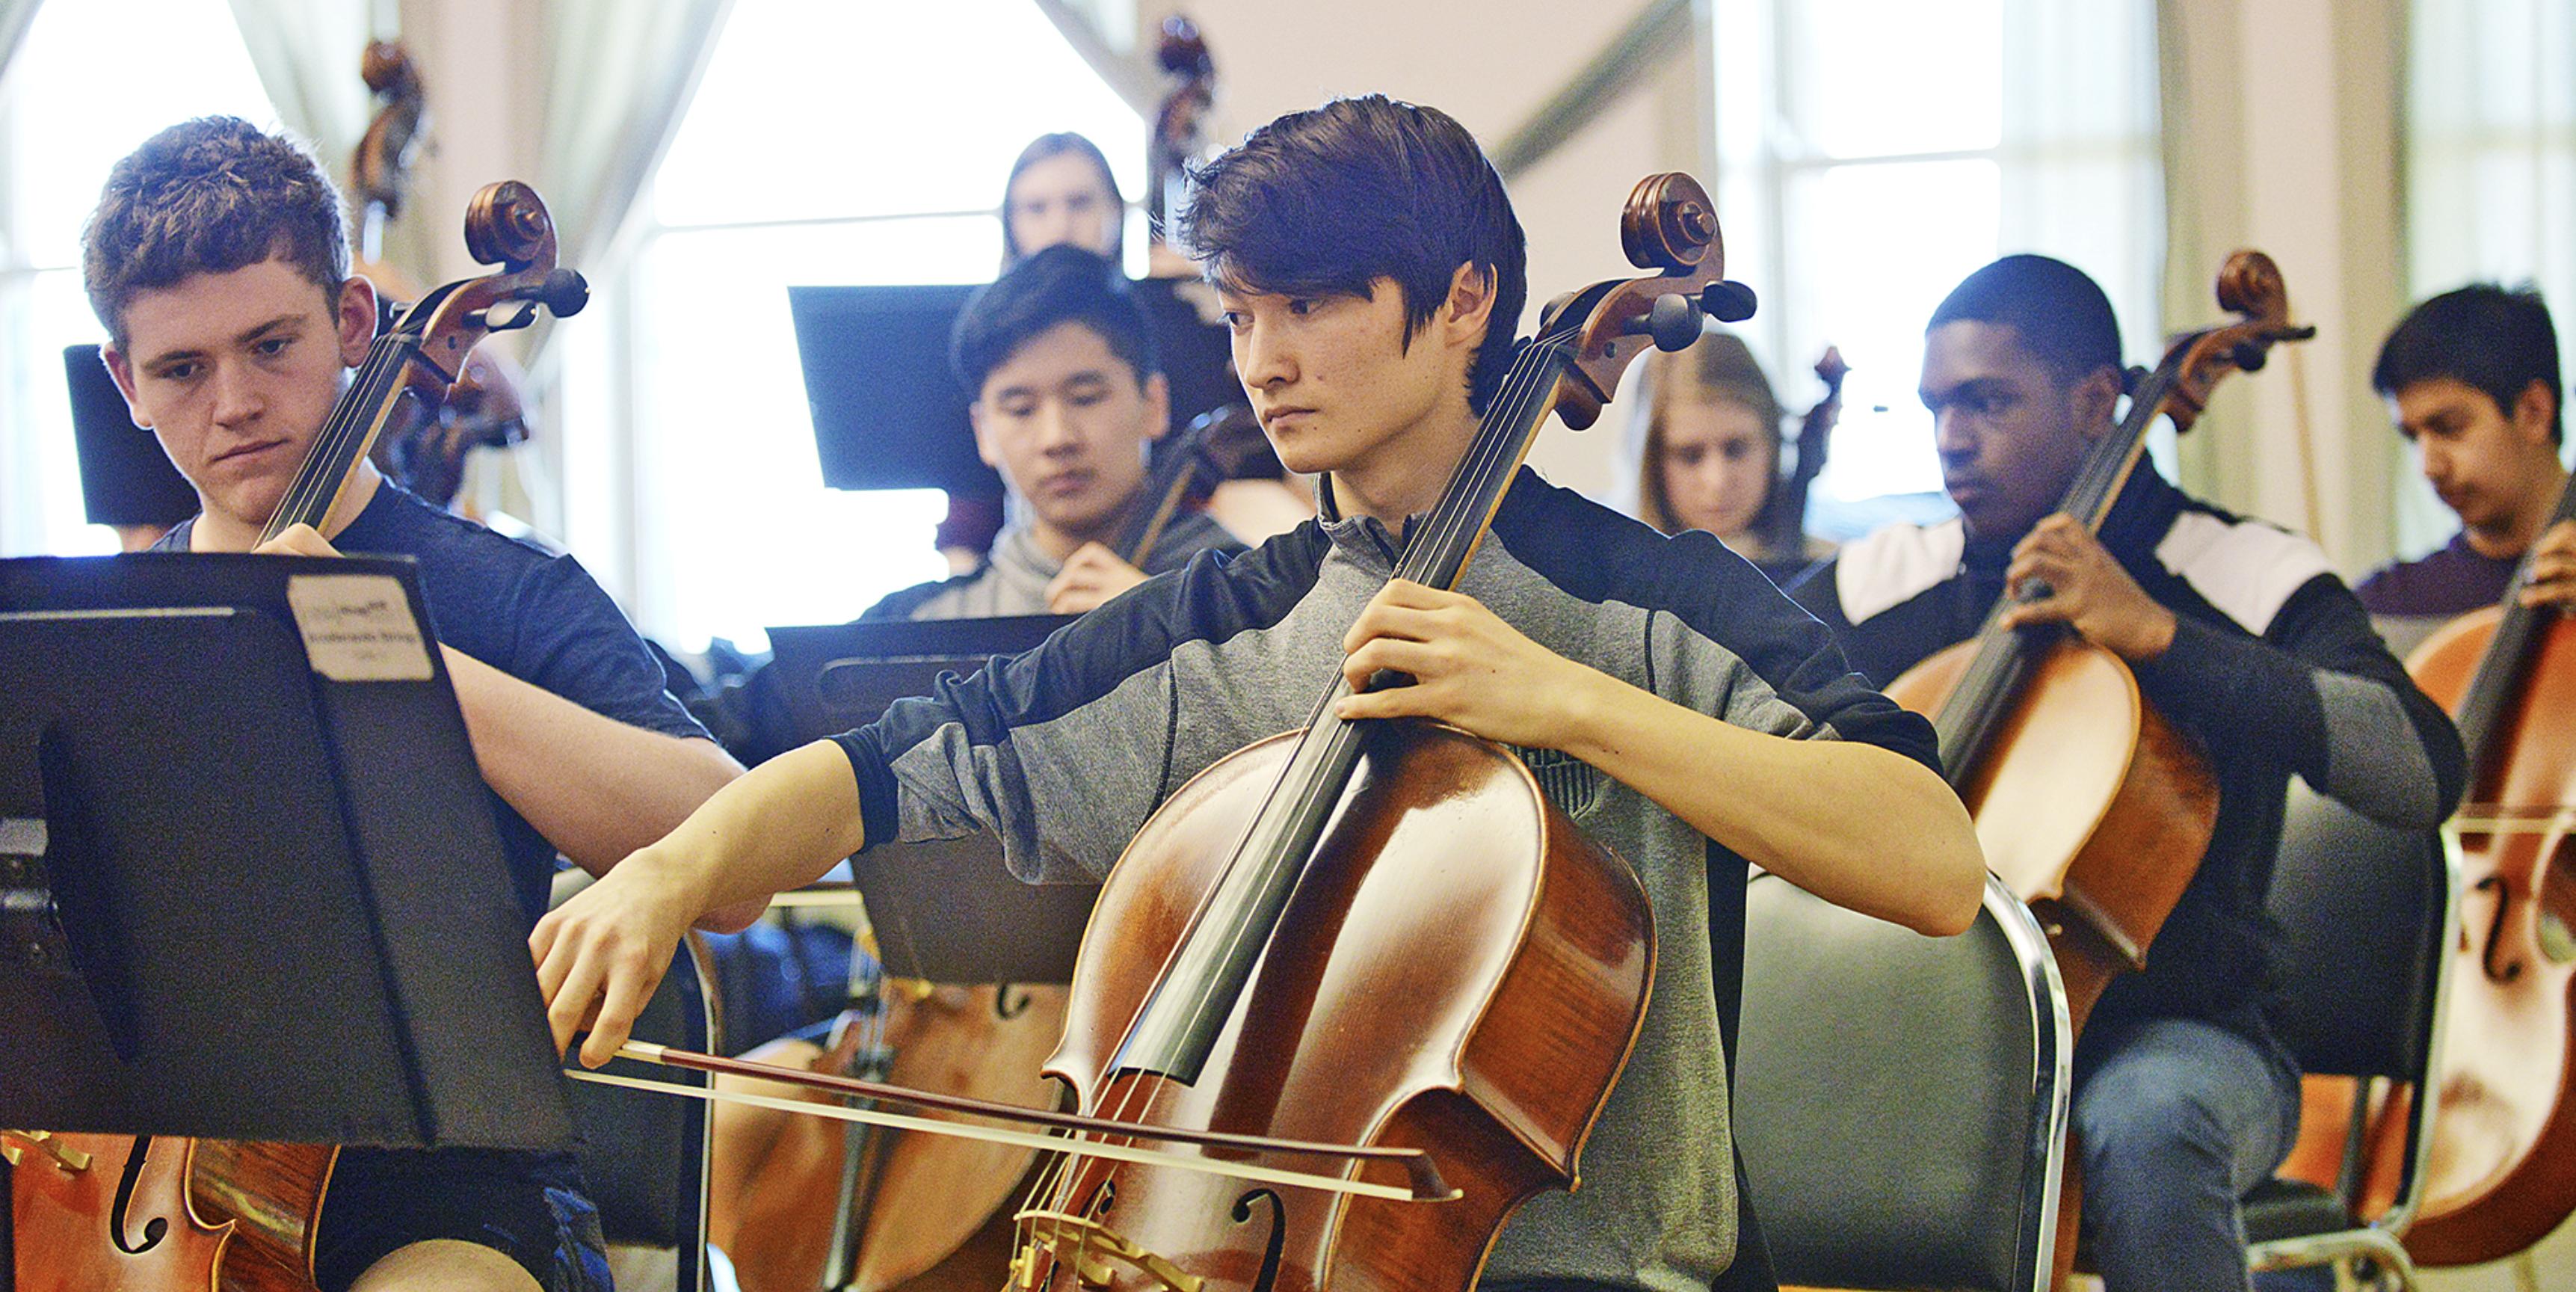 Accelerando Strings cellists rehearsing